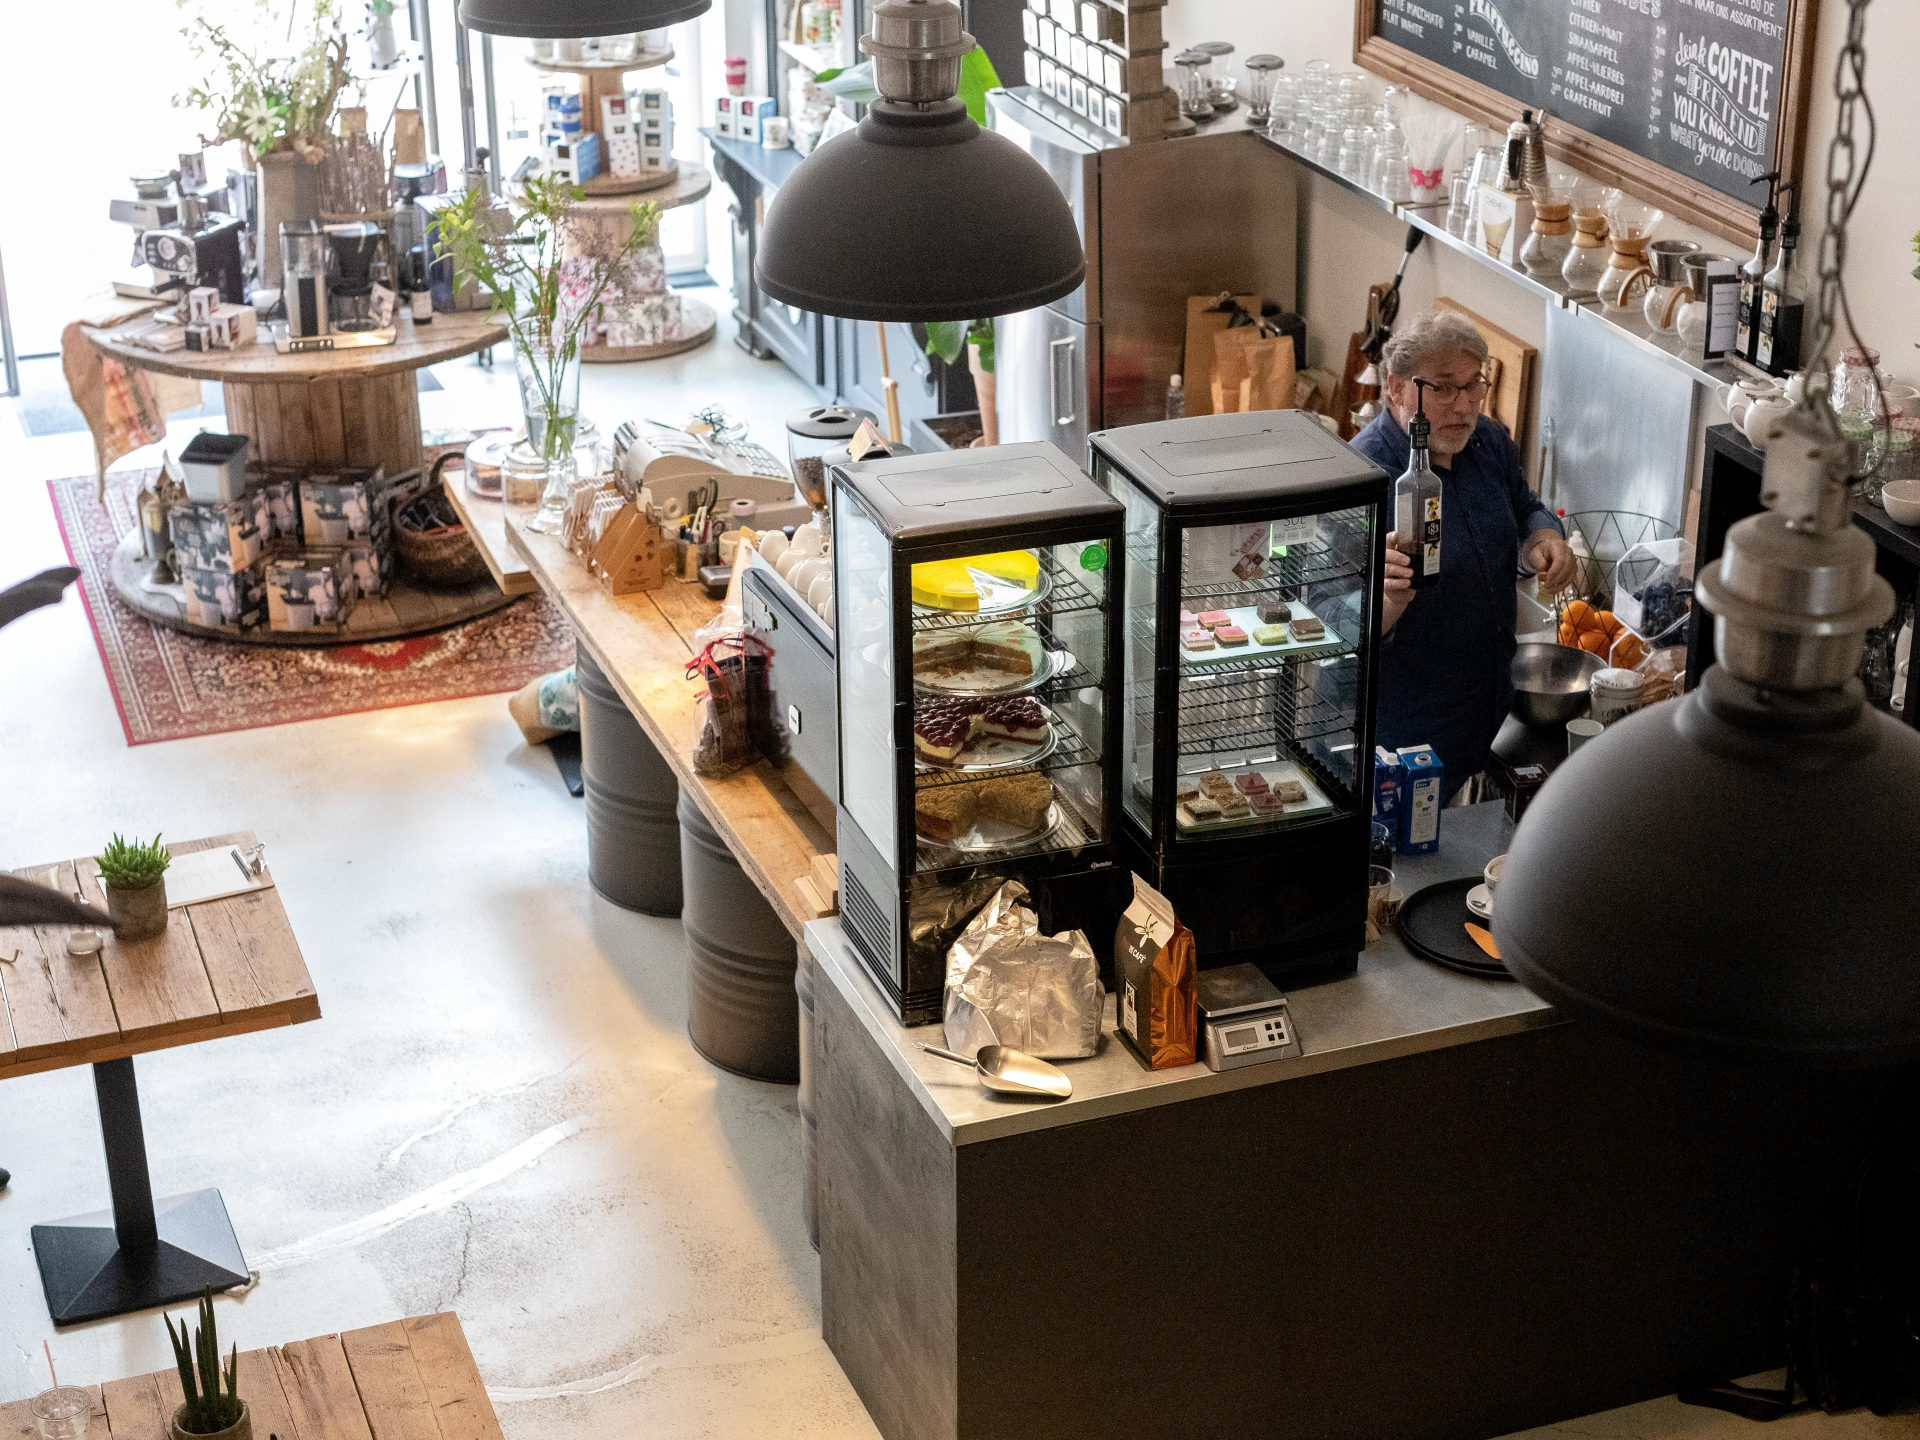 Koffiebar - In Dordrecht